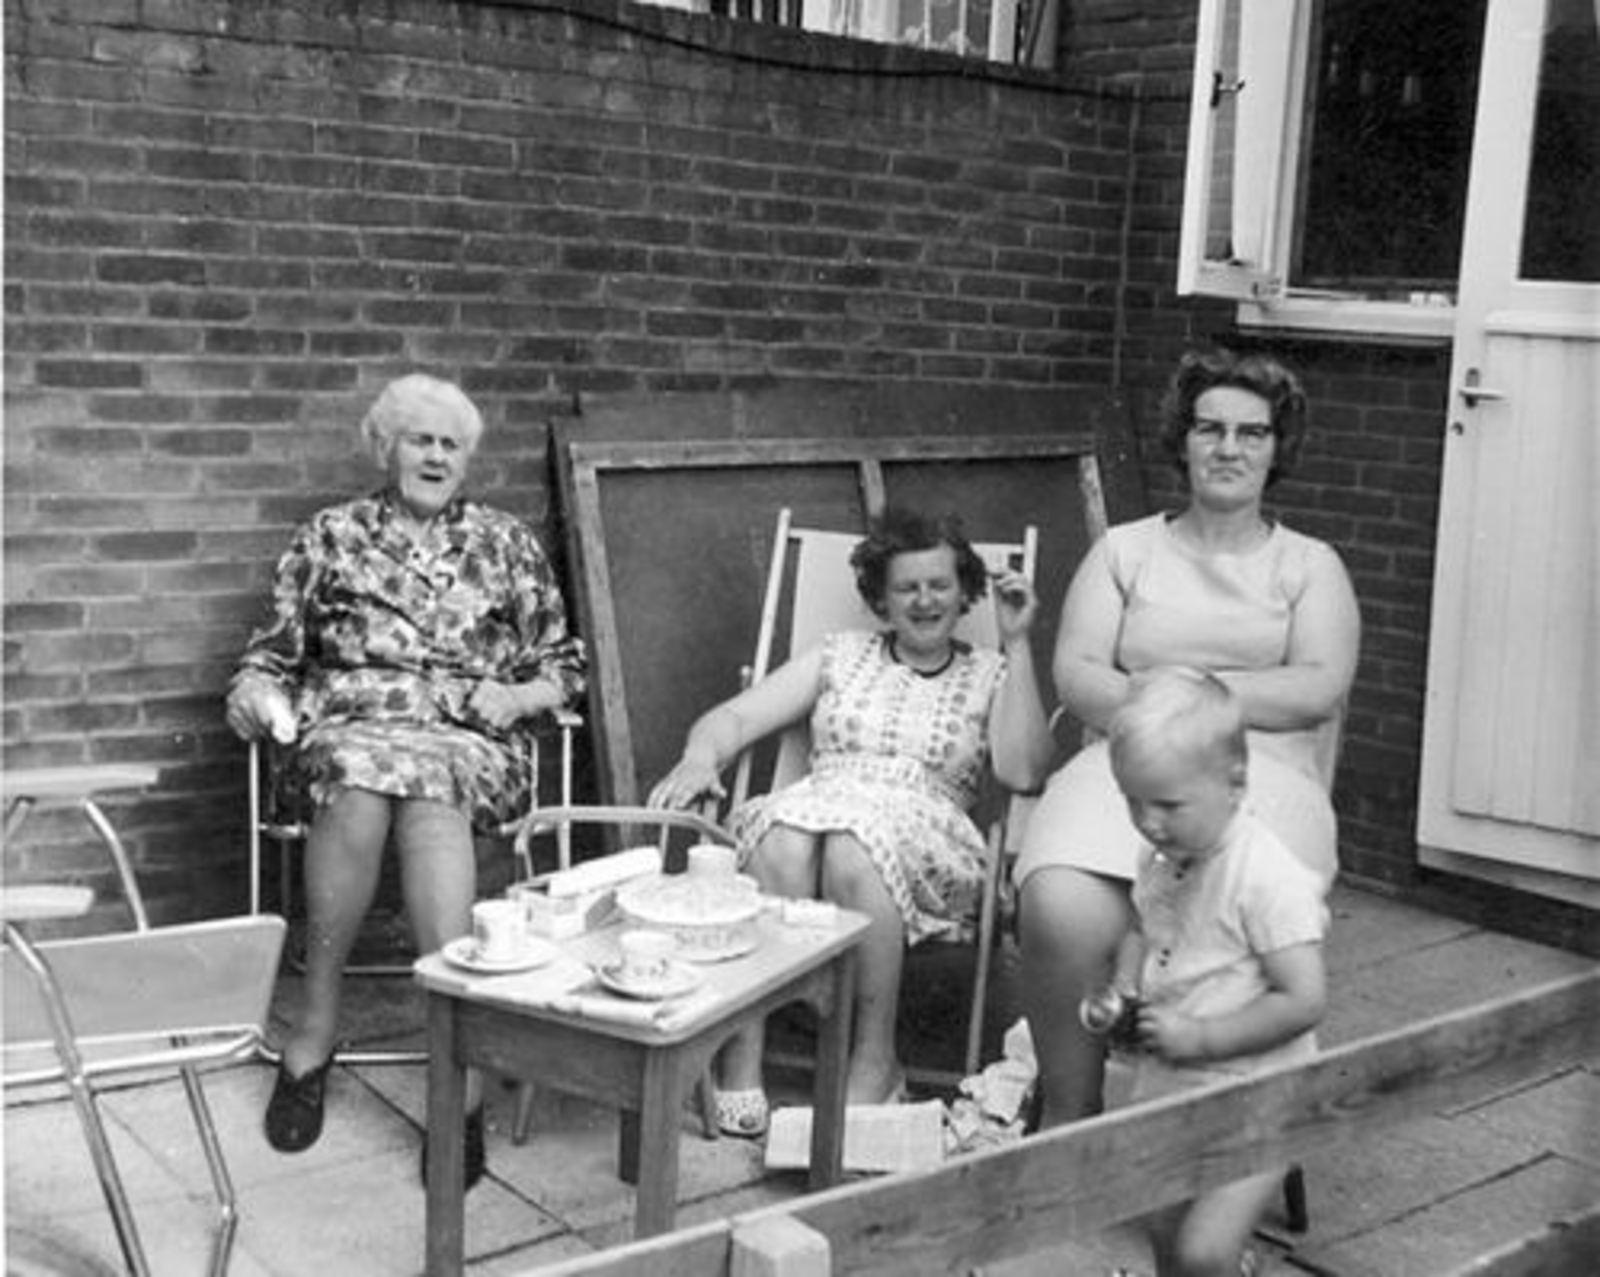 Imanse - Bliek Leentje 1920 19__ met dames Meijer bij Leentje v Veen 01